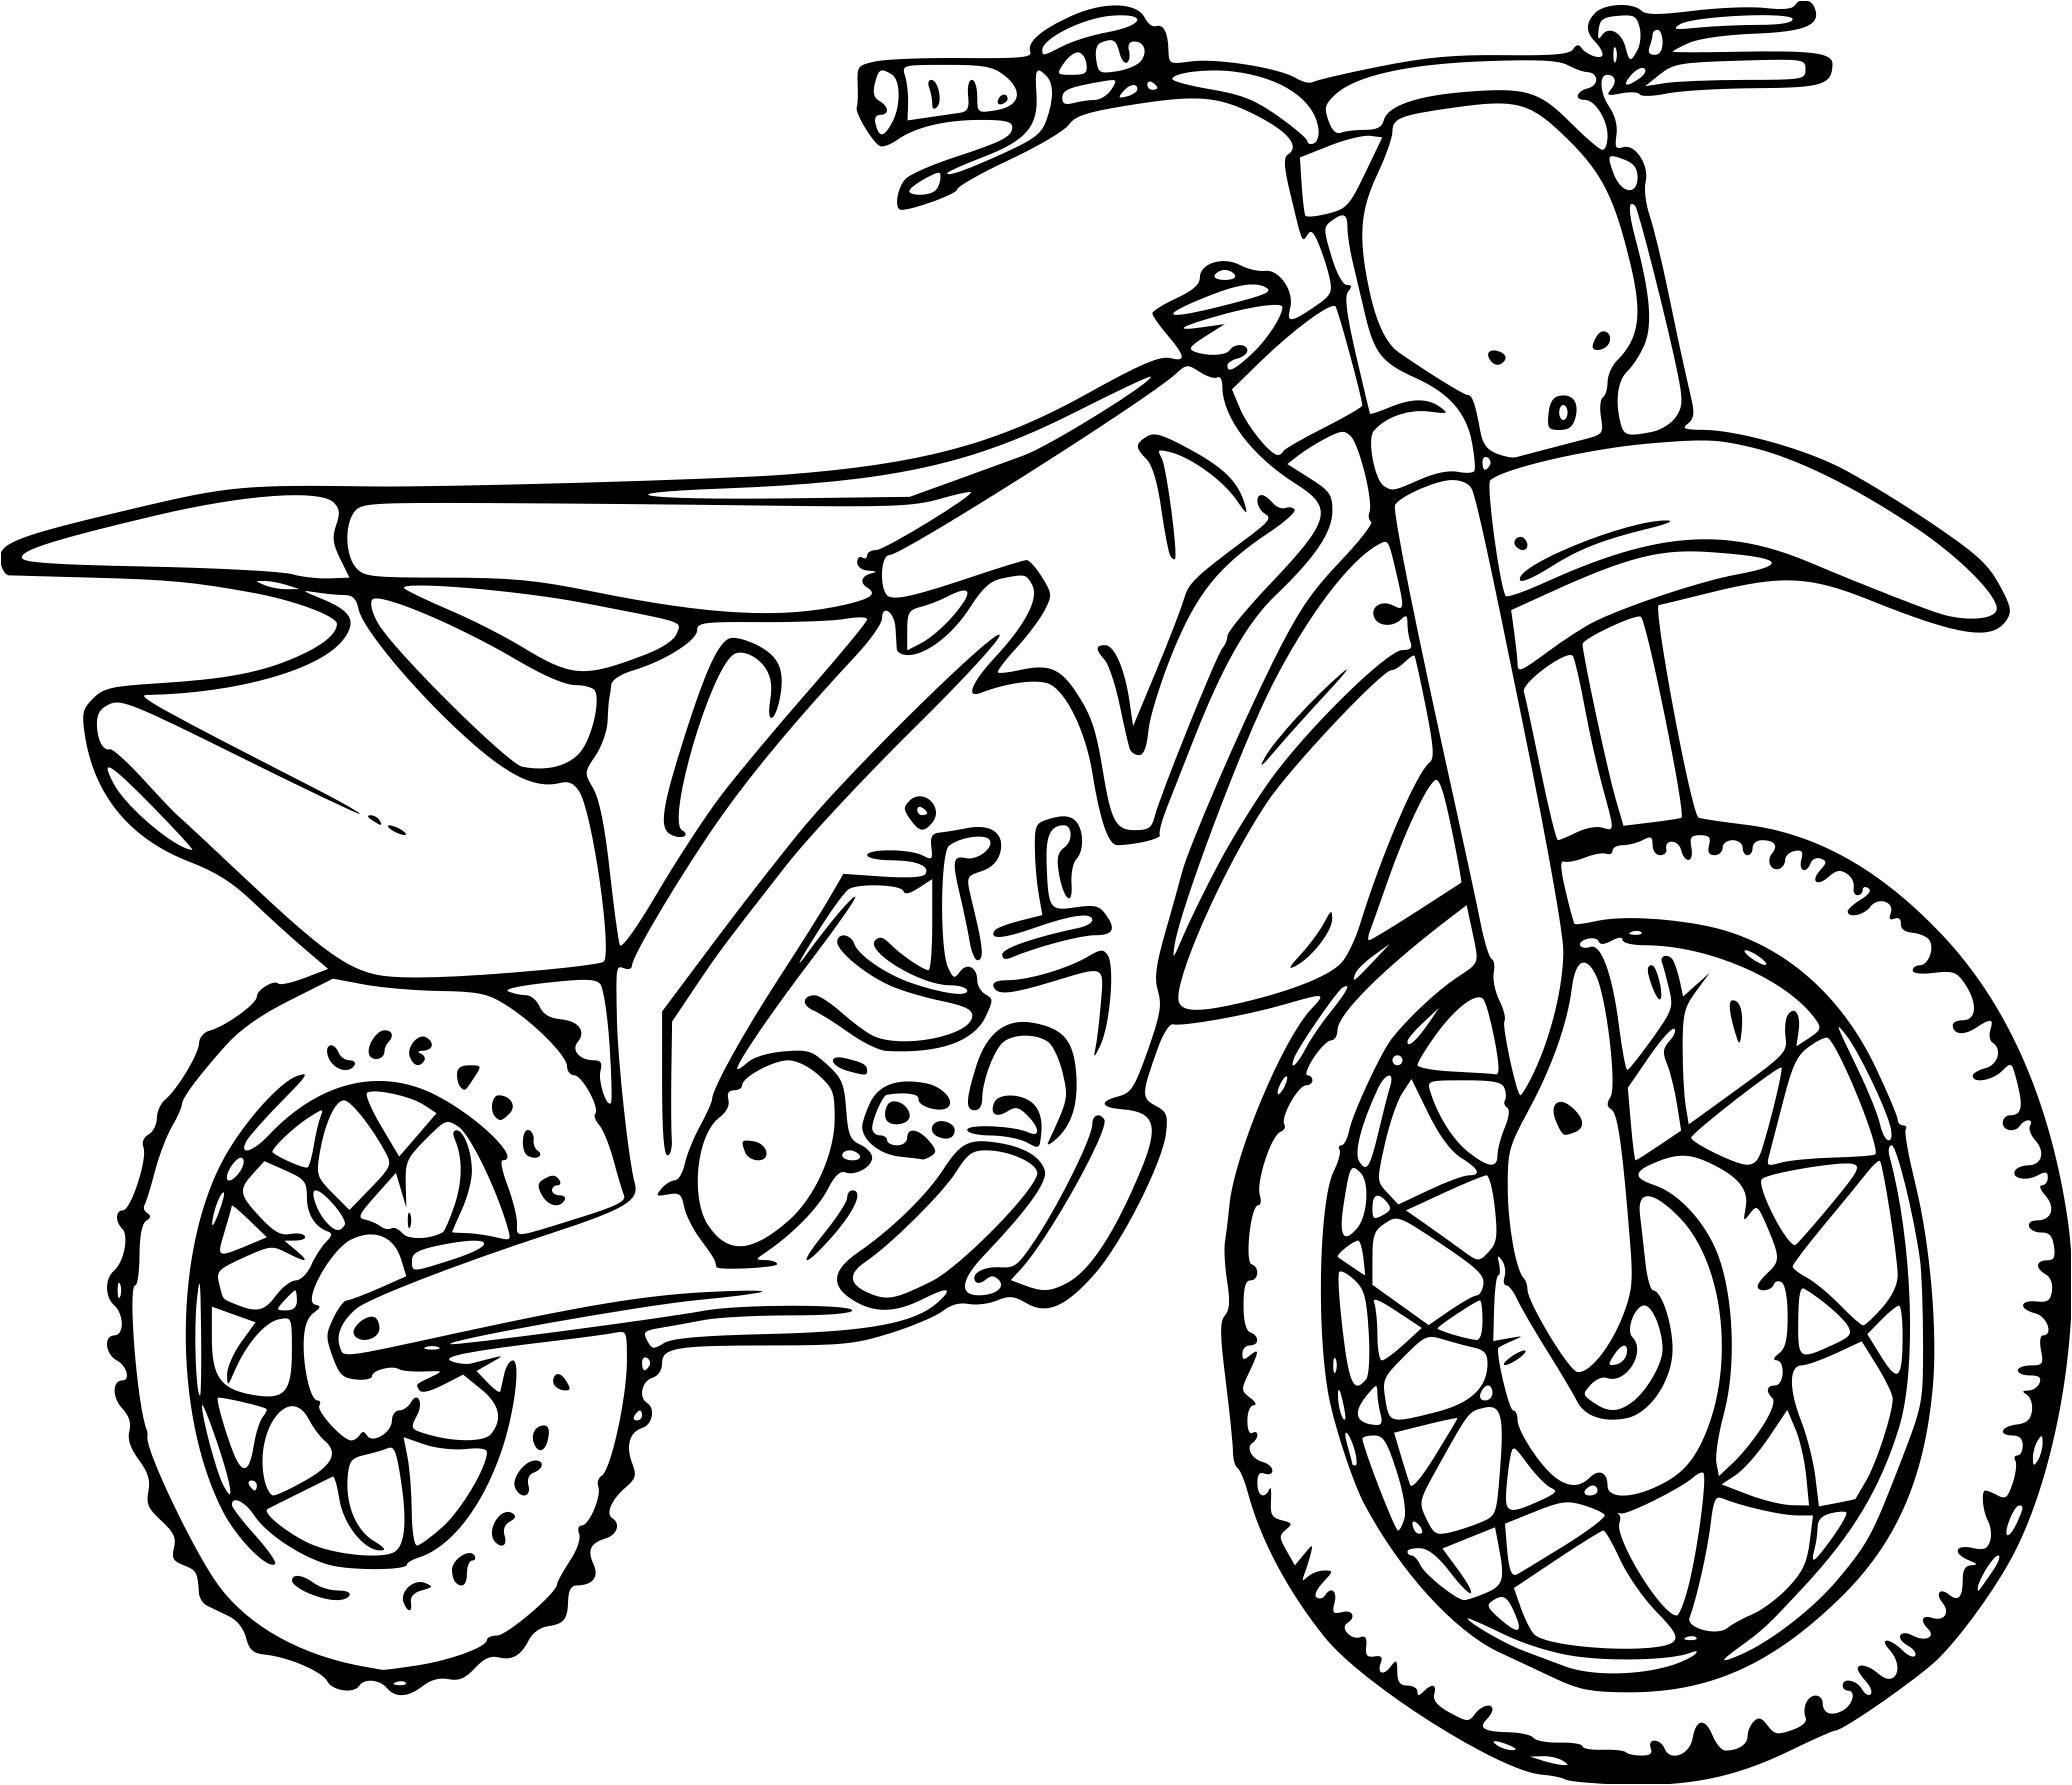 dessin à imprimer: Dessin De Moto Ktm A Imprimer